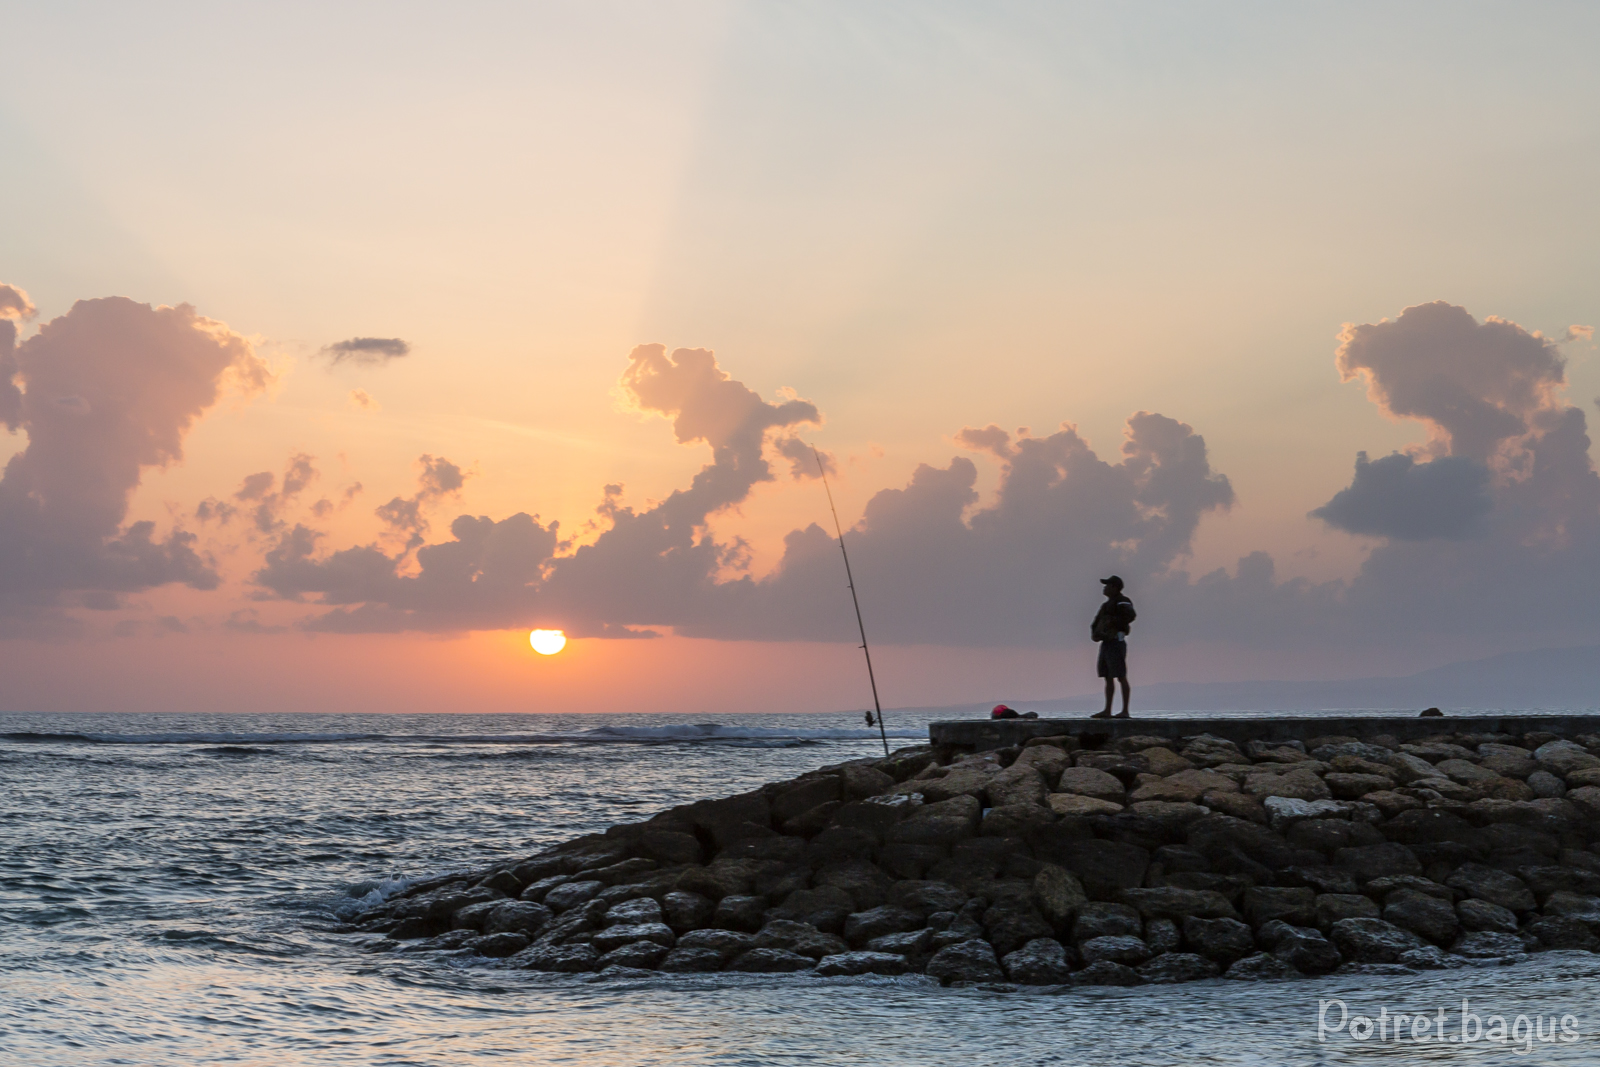 Fishing at Sanur Beach - potret bagus